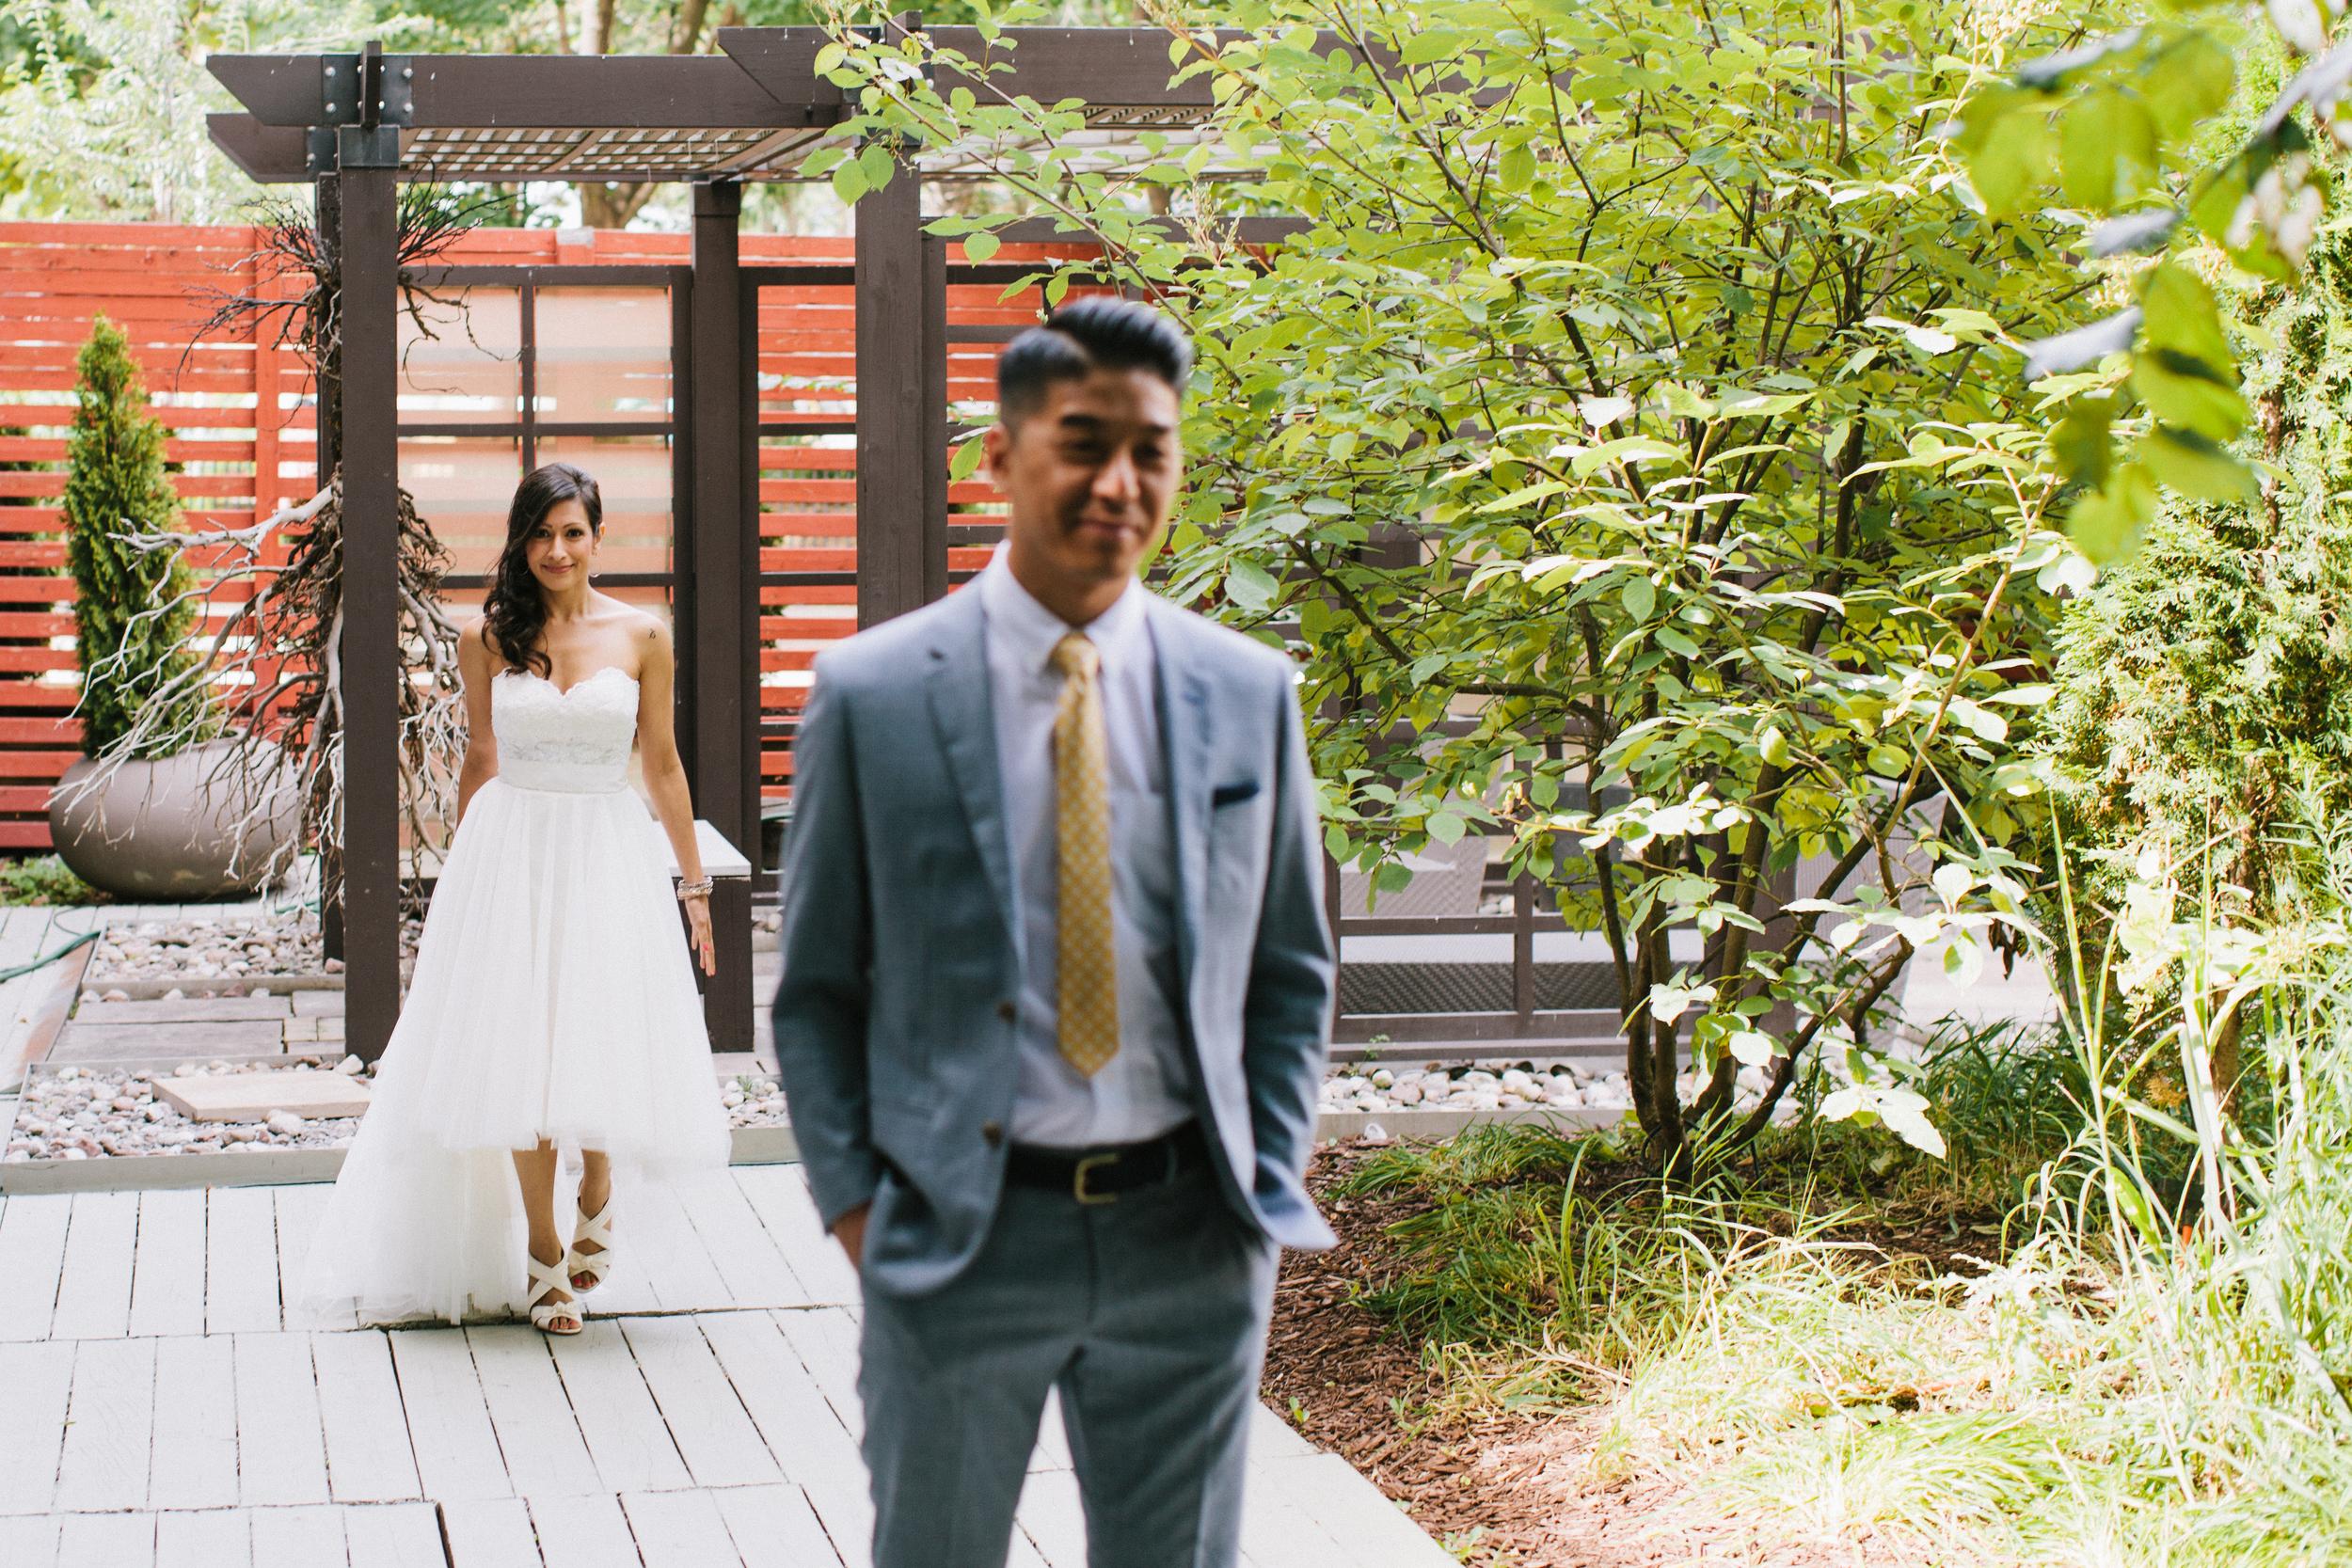 Berkeley-field-house-wedding-nicola-ken-036.jpg